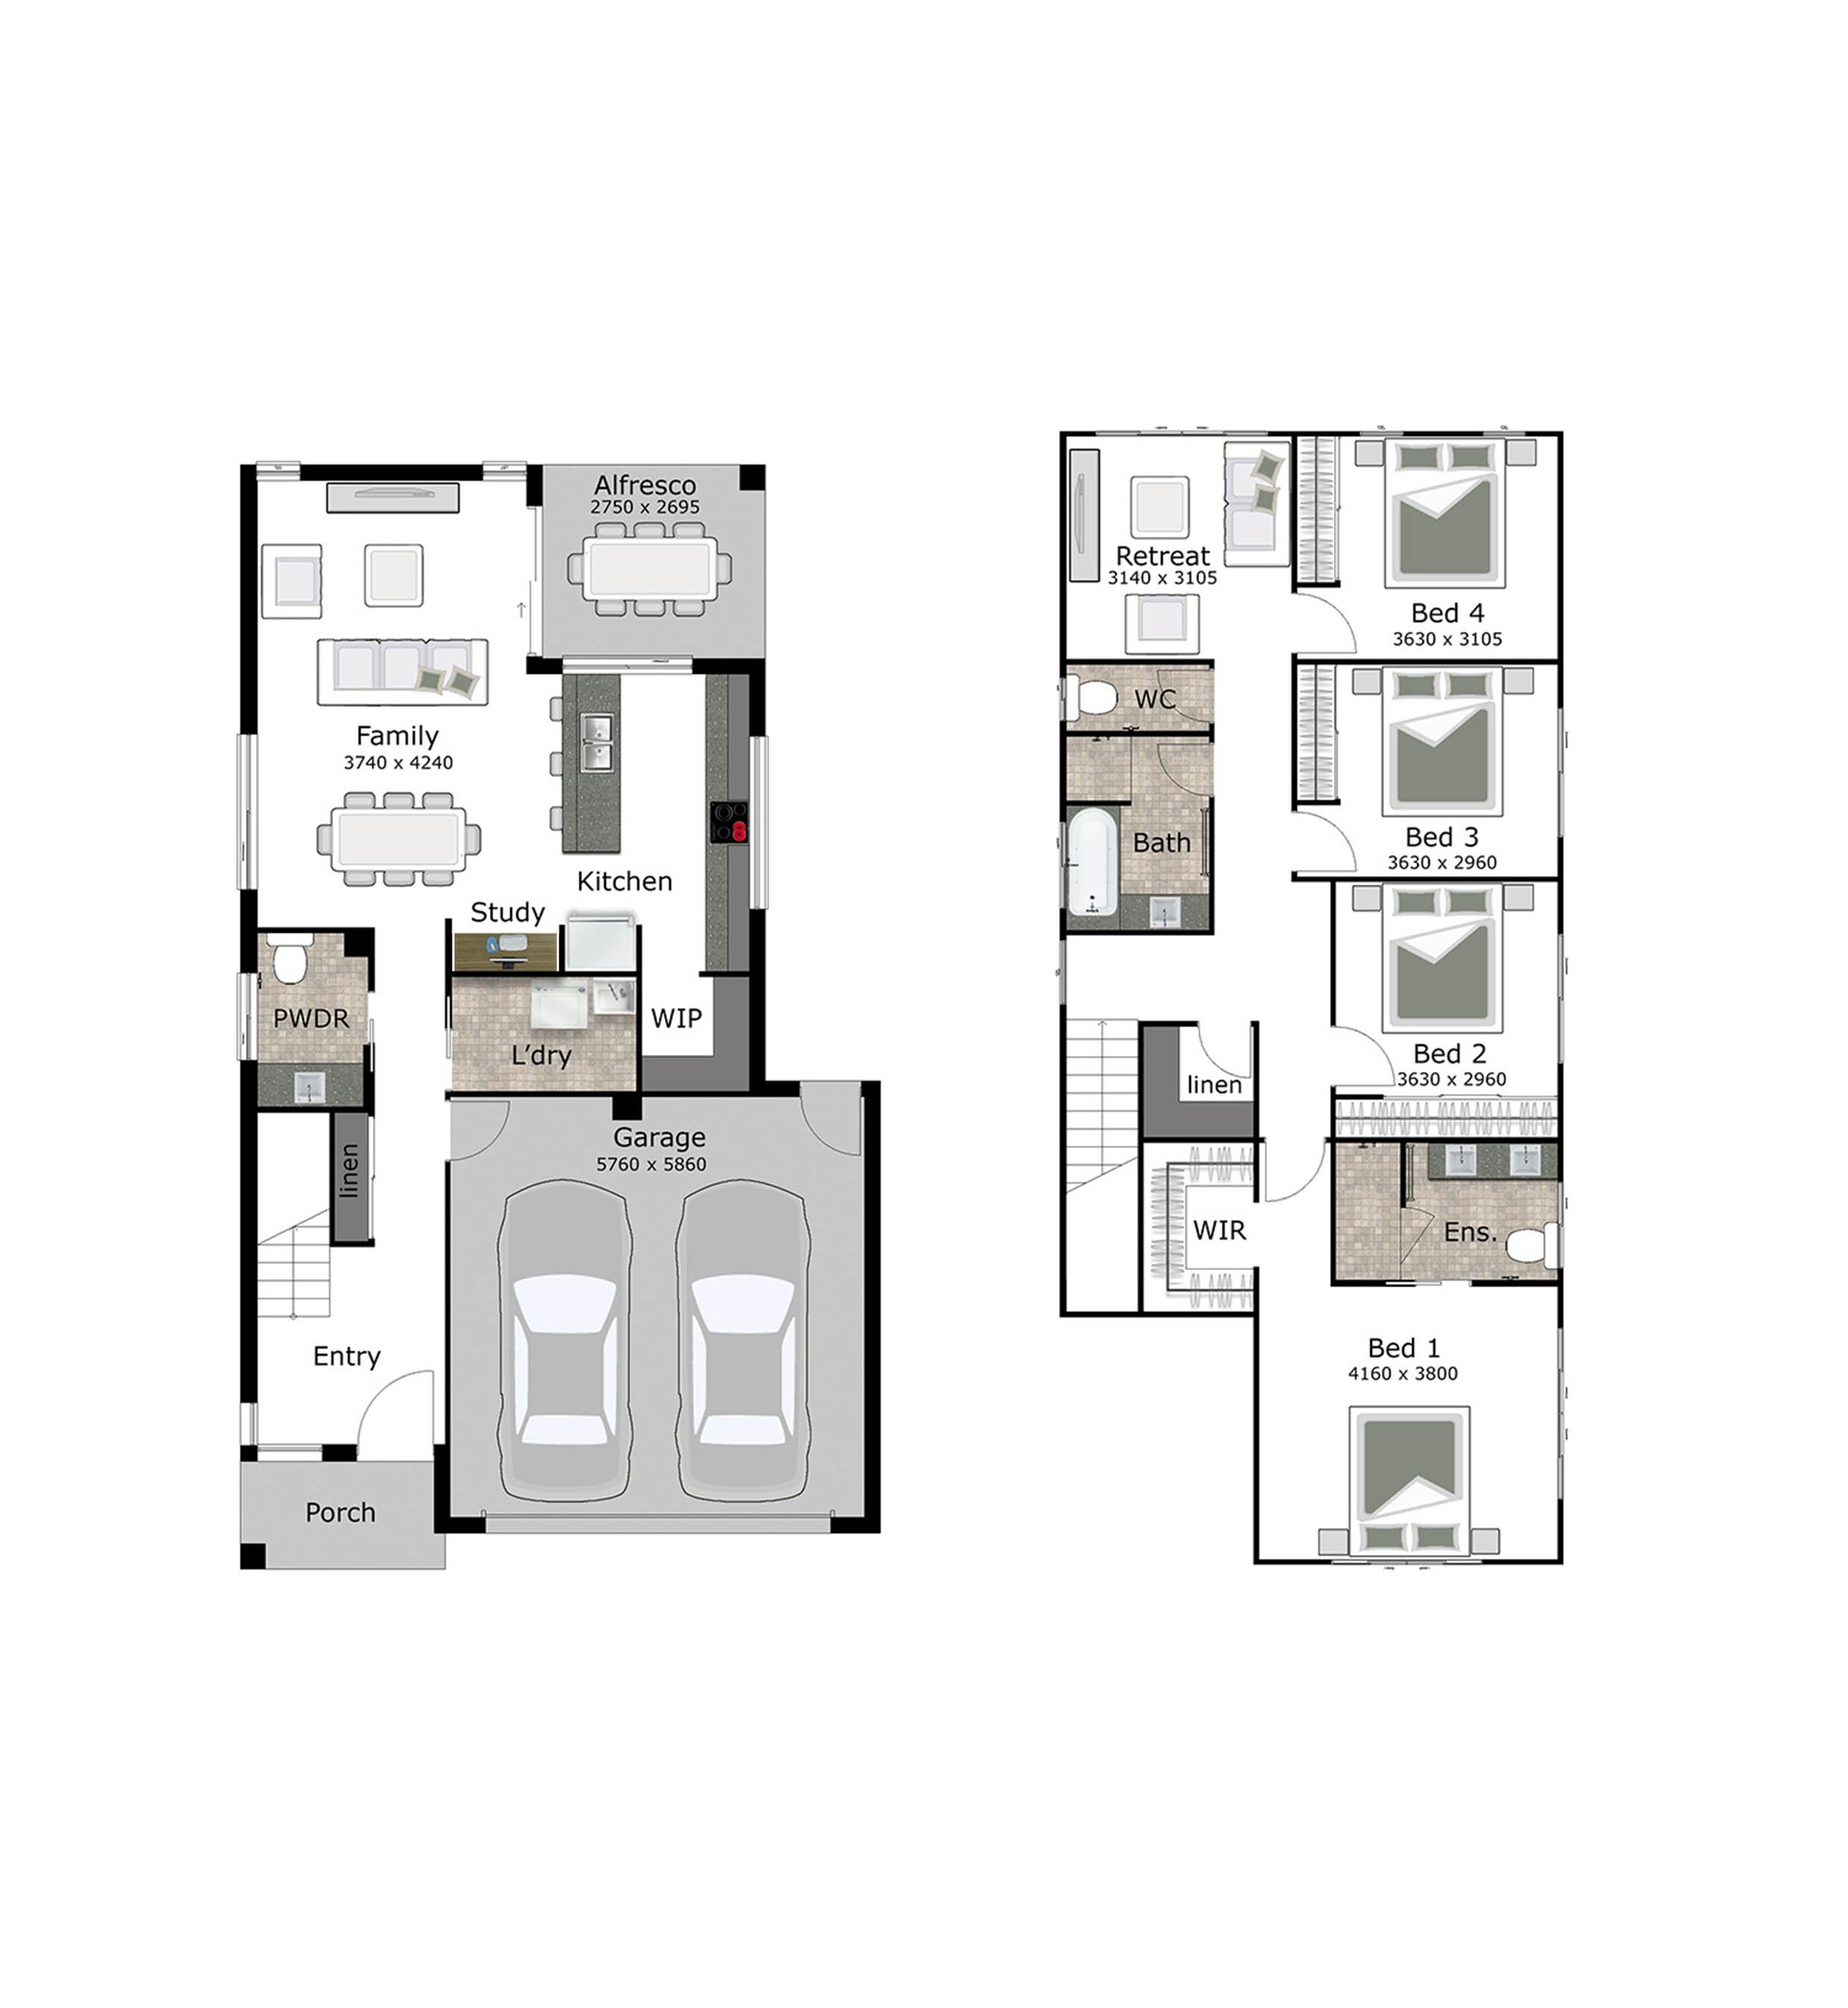 Avalon Coloured Floorplan (low Res)